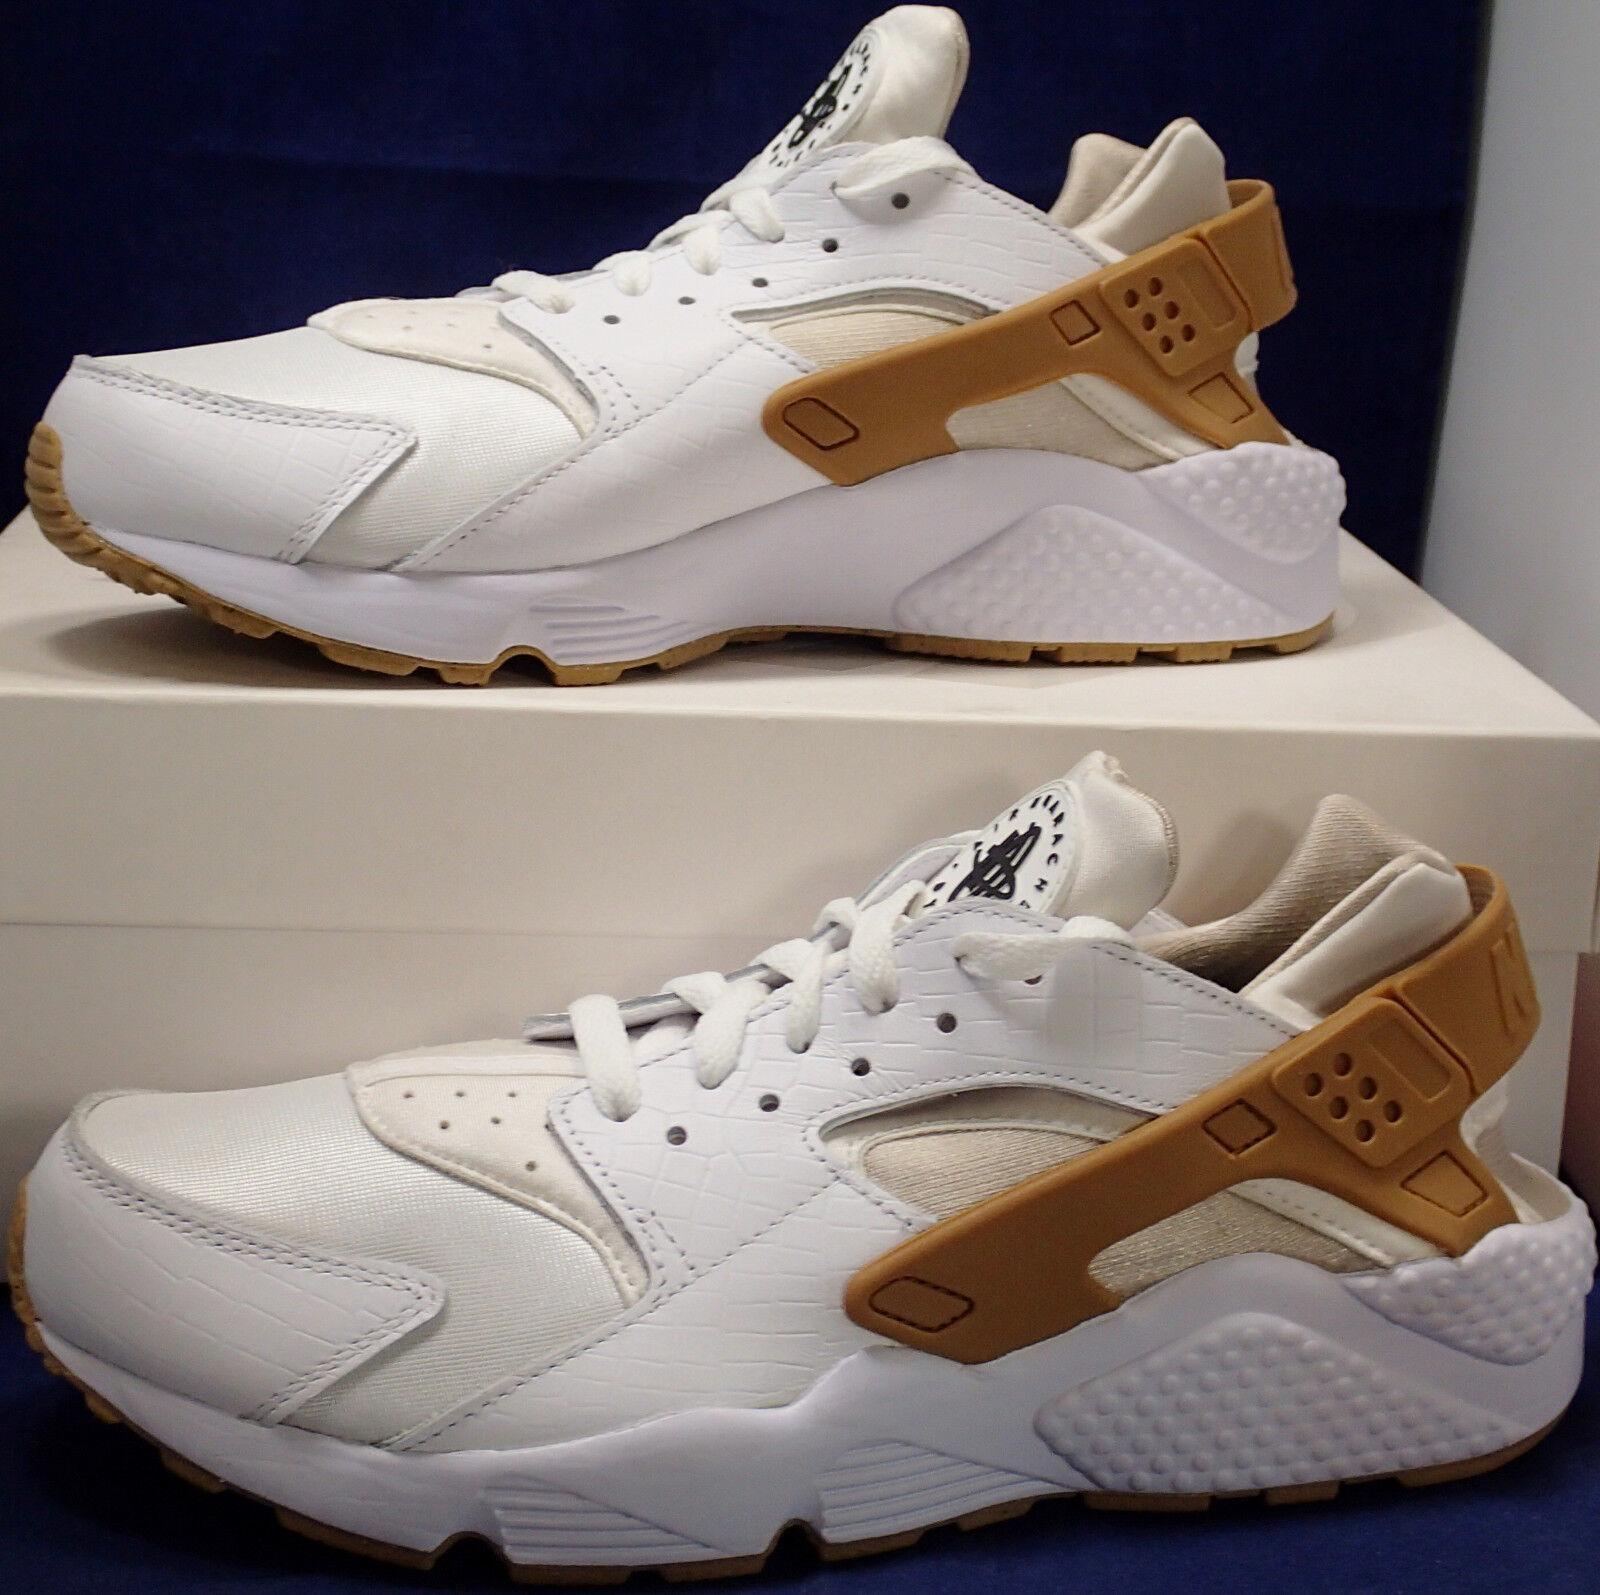 85e692e1323 Womens Nike Air Huarache Run iD Croc White White White SZ 11 Mens SZ 9.5 (